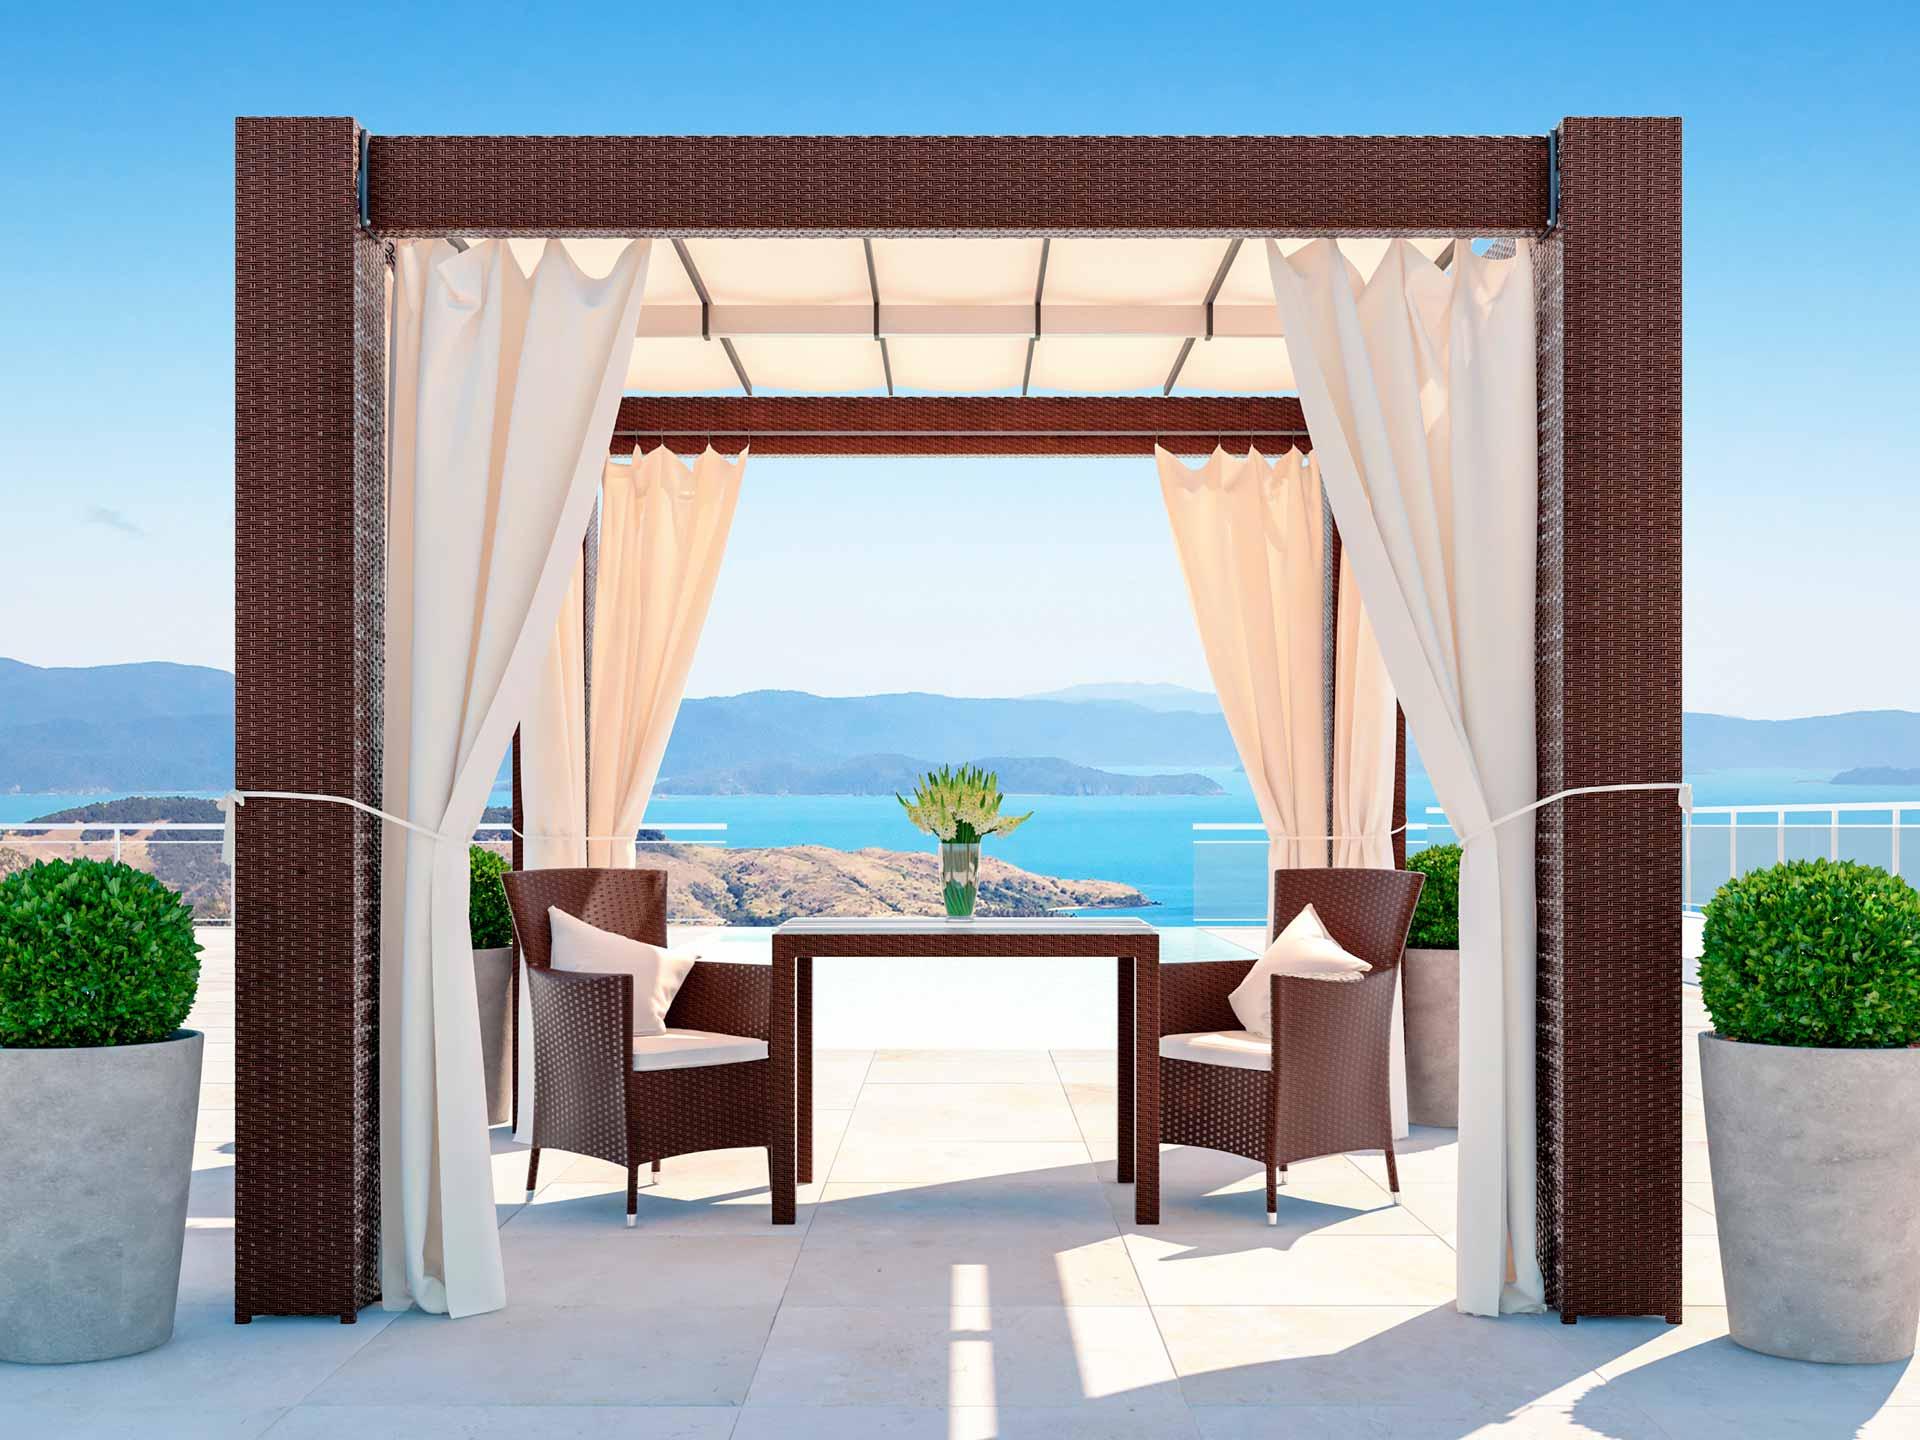 Interessant ARTELIA | Pavillion Luxus aus Rattan um Lounge Stil kaufen QV17